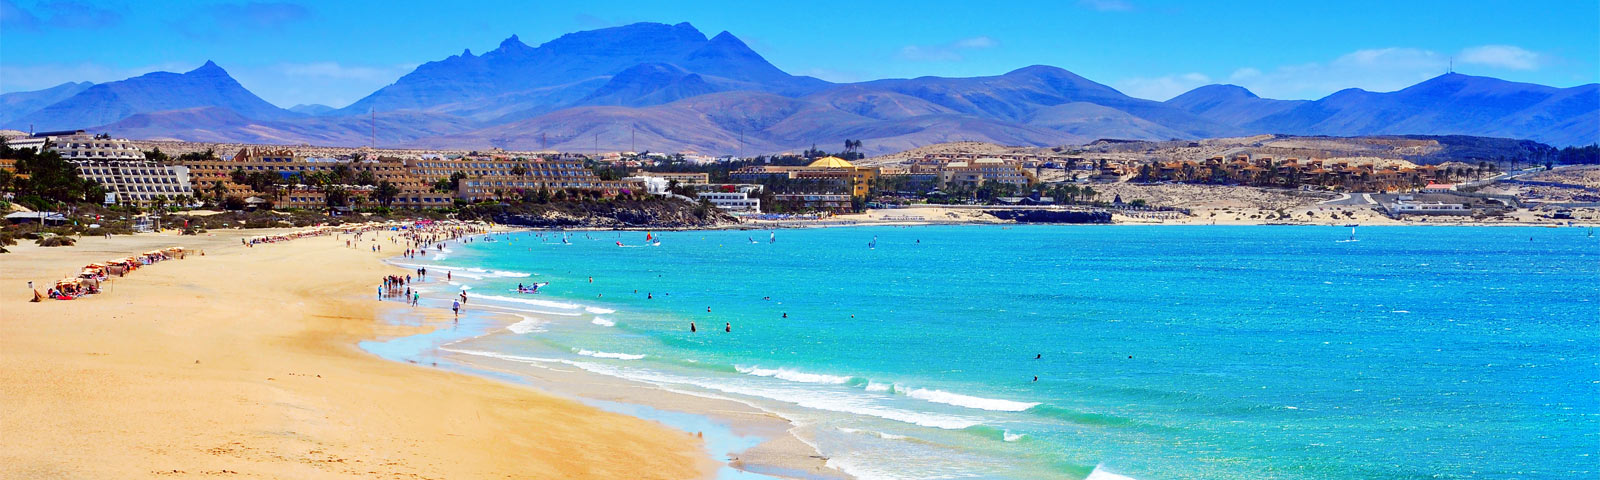 Fuerteventura Spain  city pictures gallery : Sheraton Fuerteventura Beach, Golf and Spa Resort | Spain